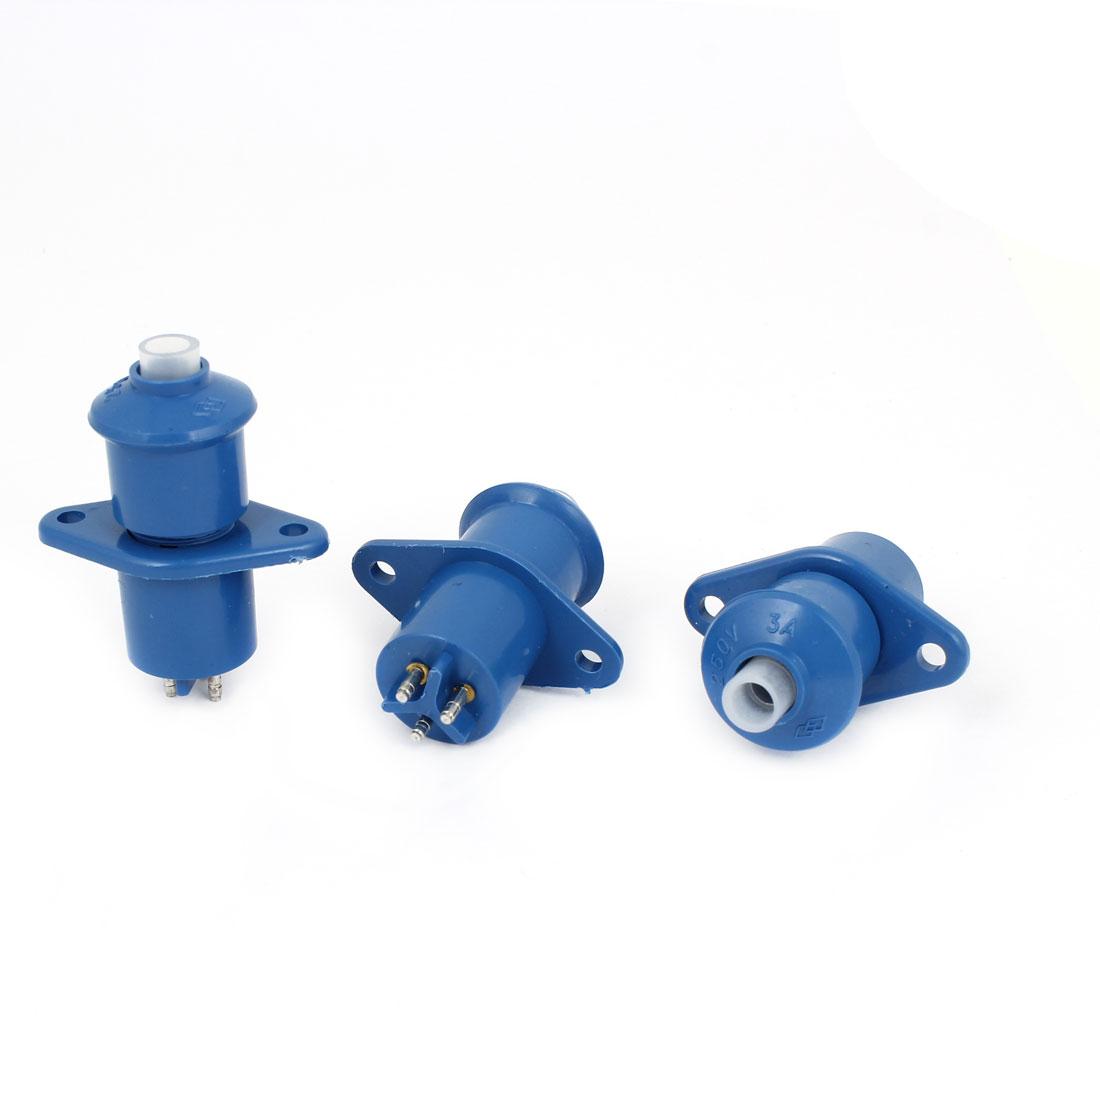 AC 250V 3A Blue 3P Male Female Power Socket Connector 3pcs